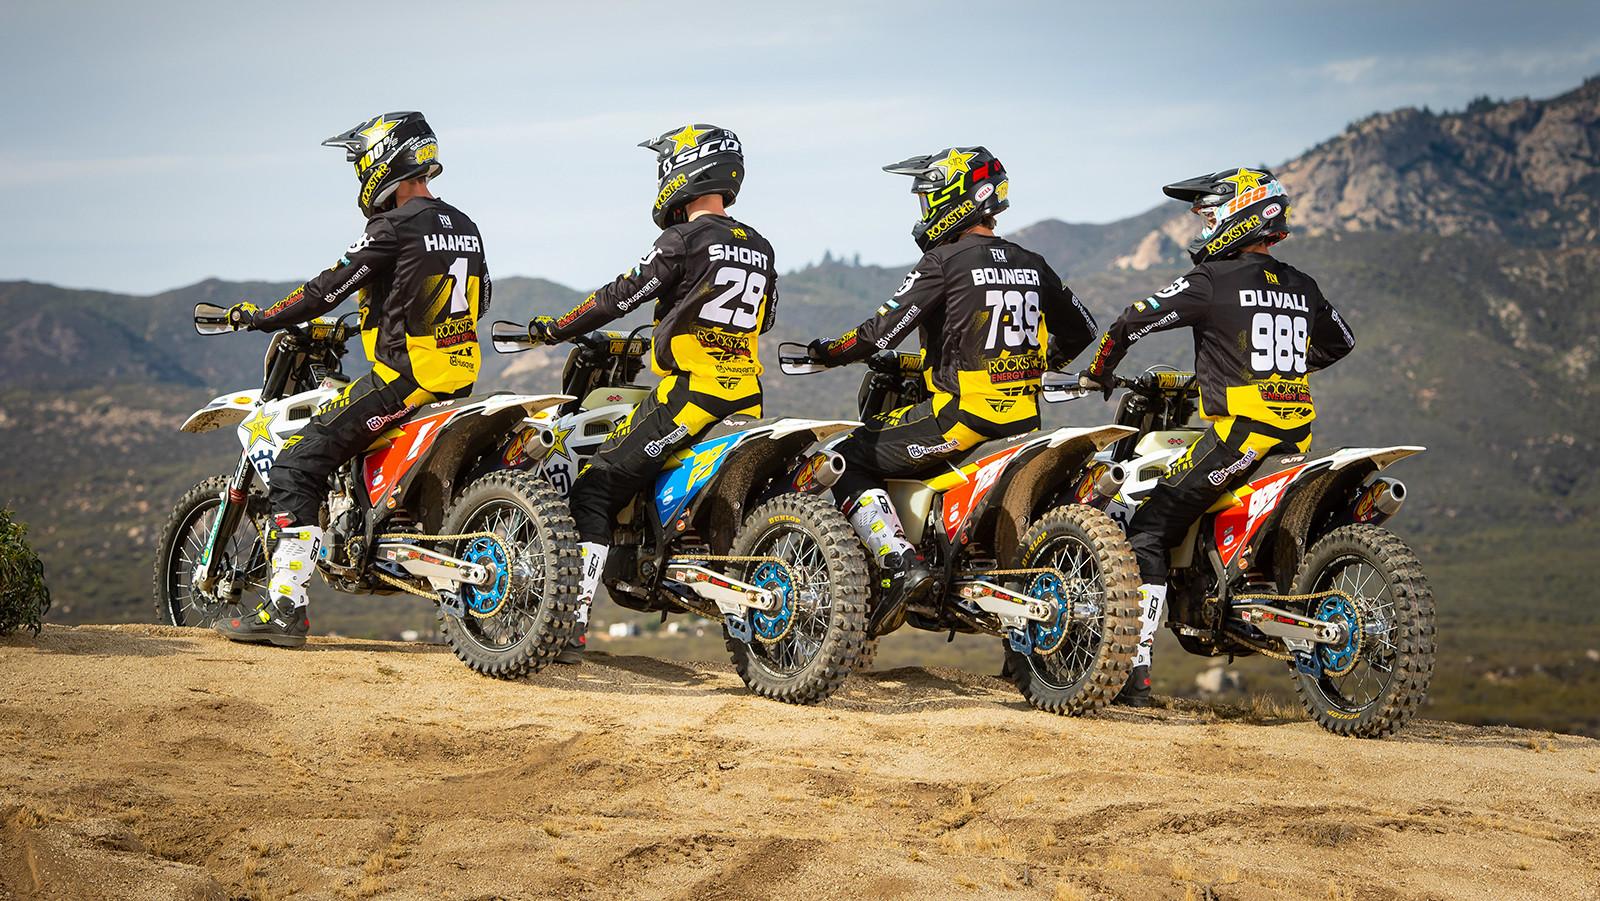 2019 Rockstar Energy Husqvarna US Off-Road Team: Andrew Short, Colton Haaker, Thad Duvall and Trevor Bollinger